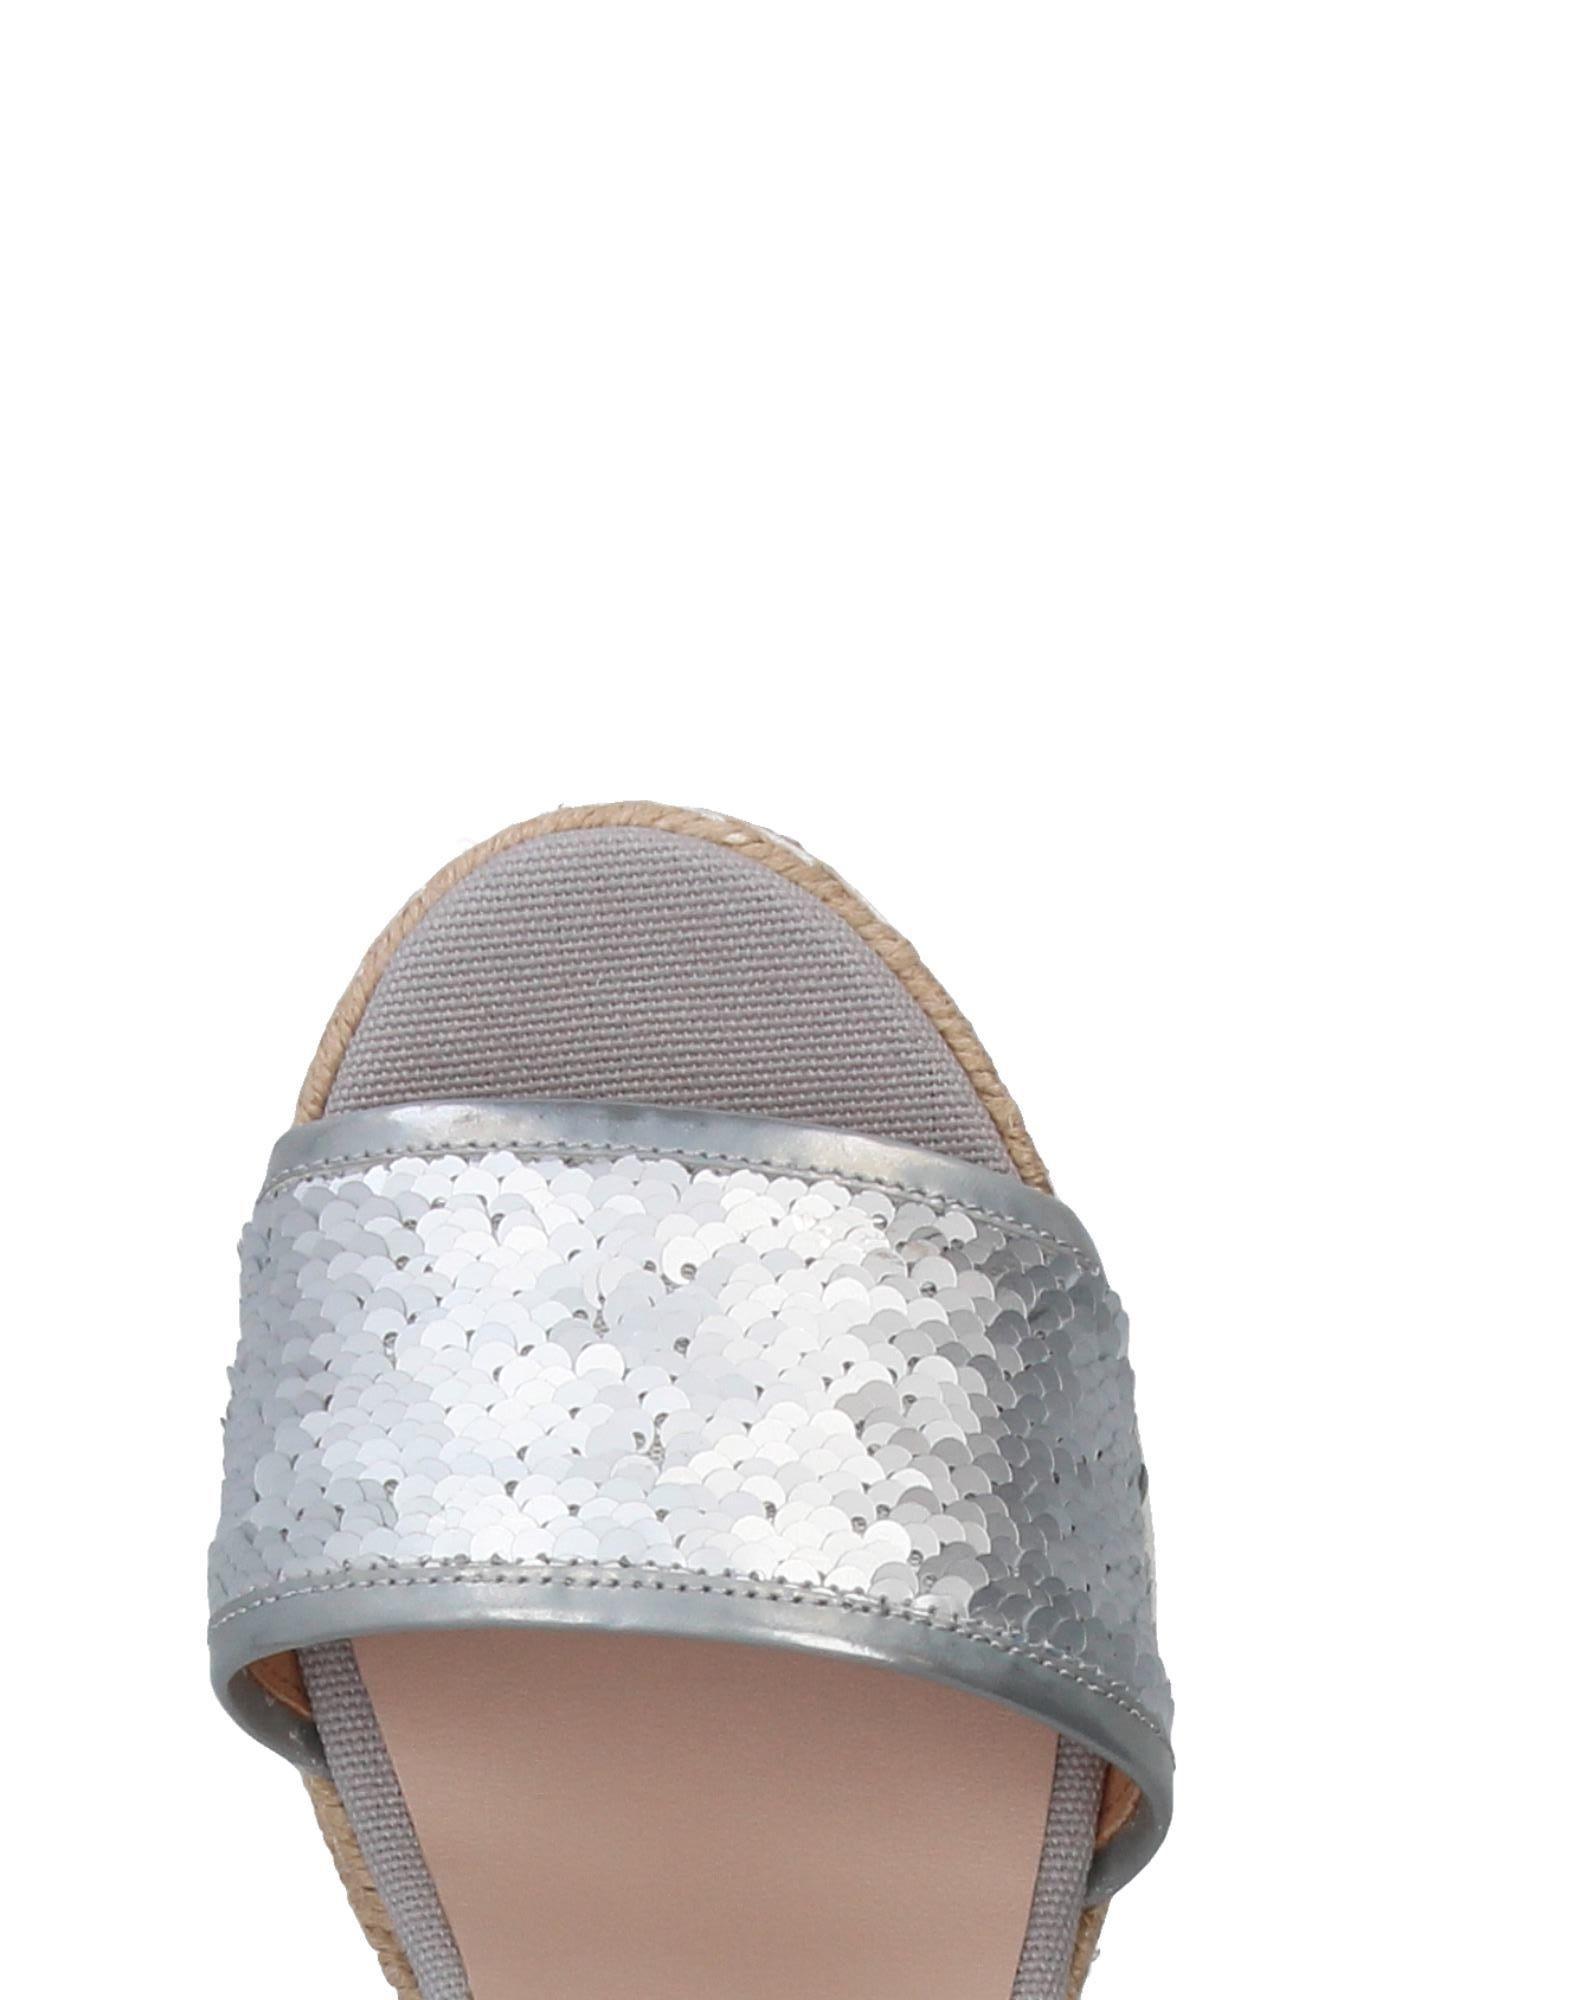 Kanna Sandalen  Damen  Sandalen 11408568RW Gute Qualität beliebte Schuhe 4c3f79